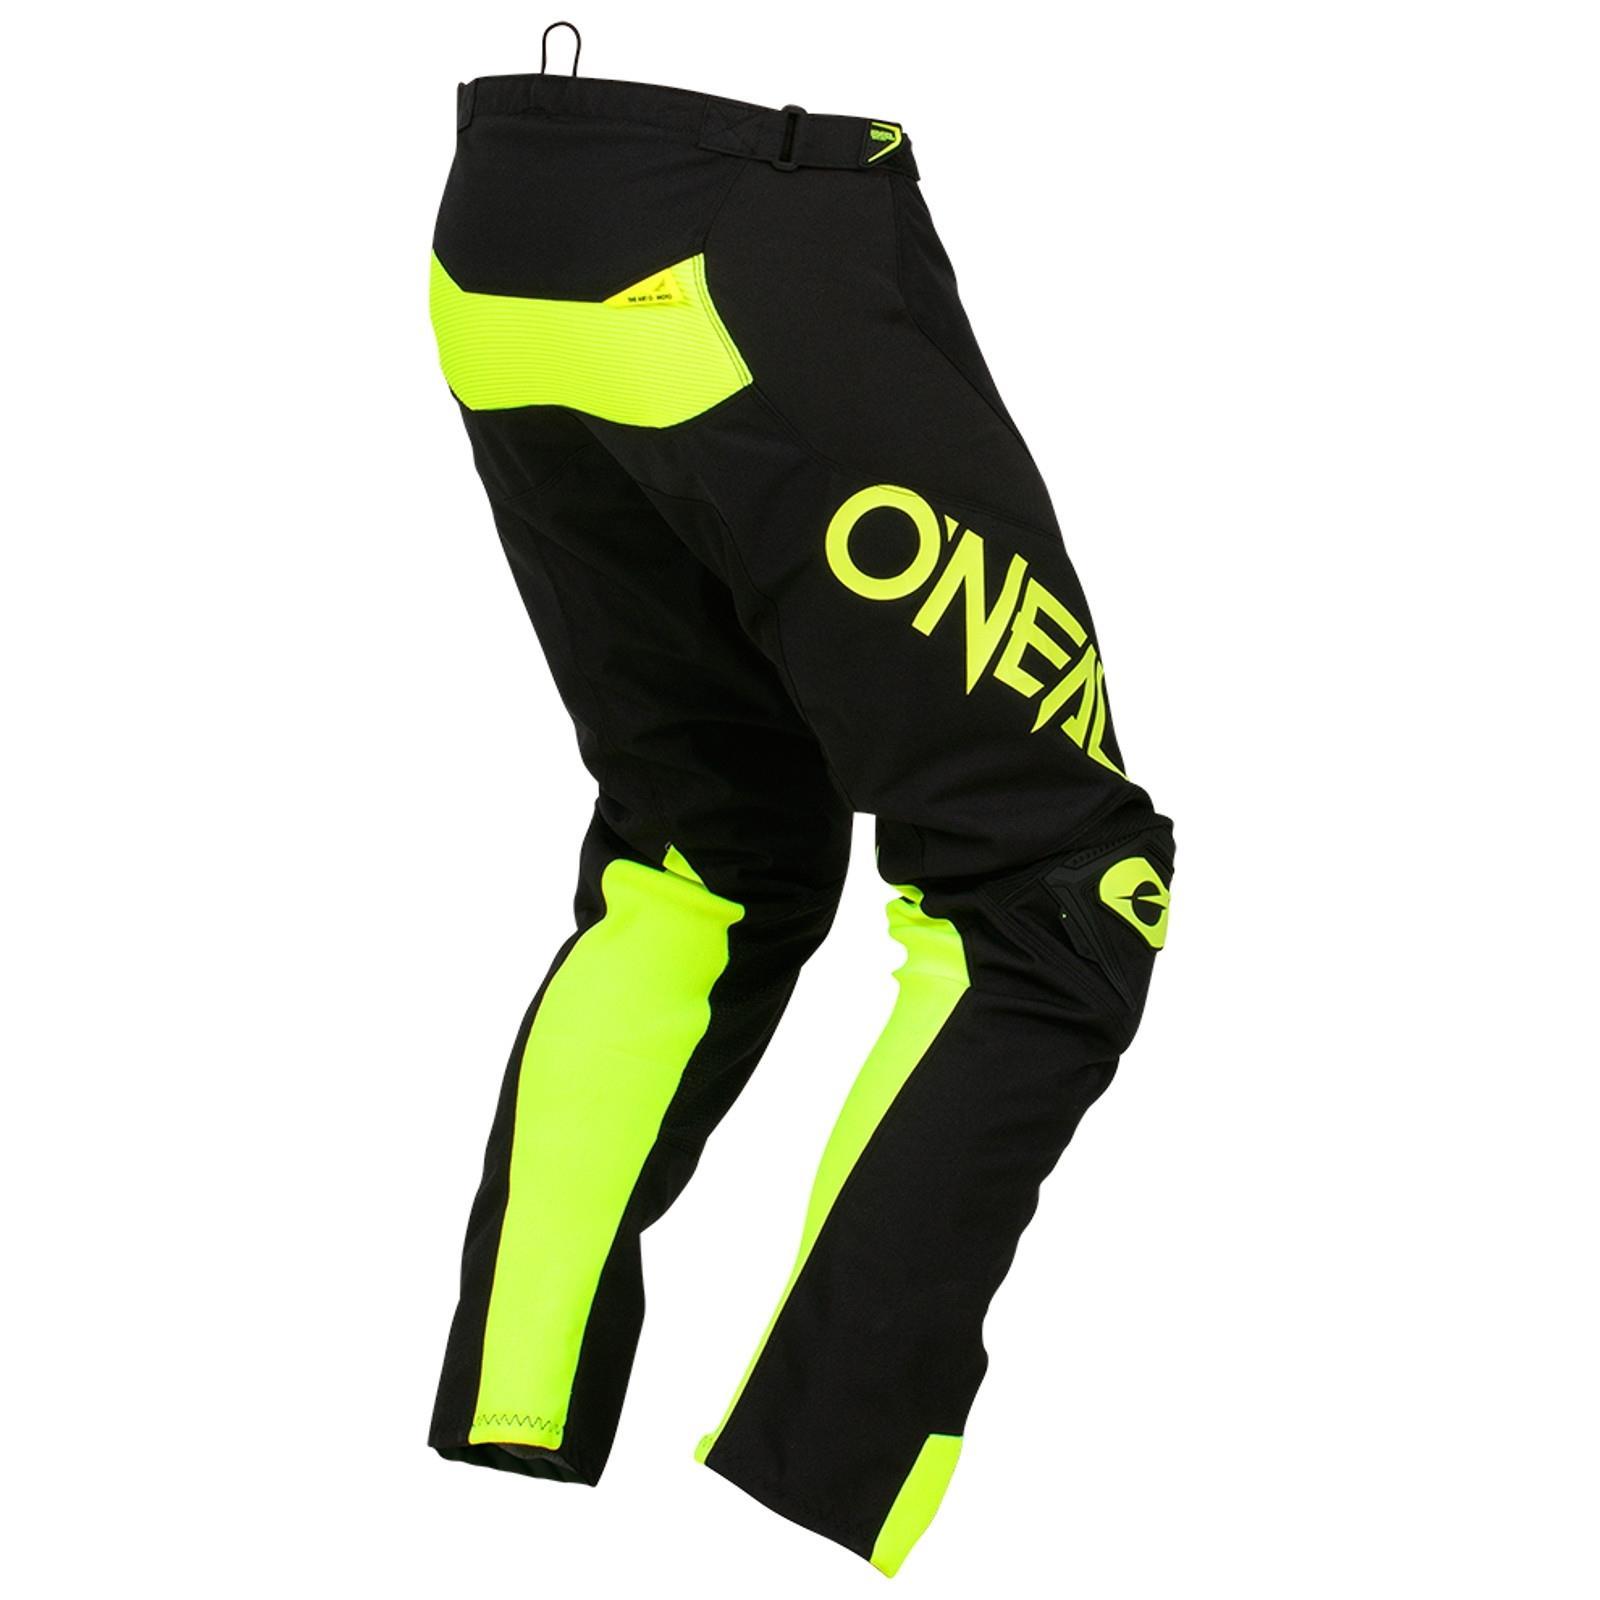 Oneal-elemento-Mayhem-Hardwear-Pants-pantalones-MX-DH-FR-Moto-Cross-Enduro-MTB-moto miniatura 53